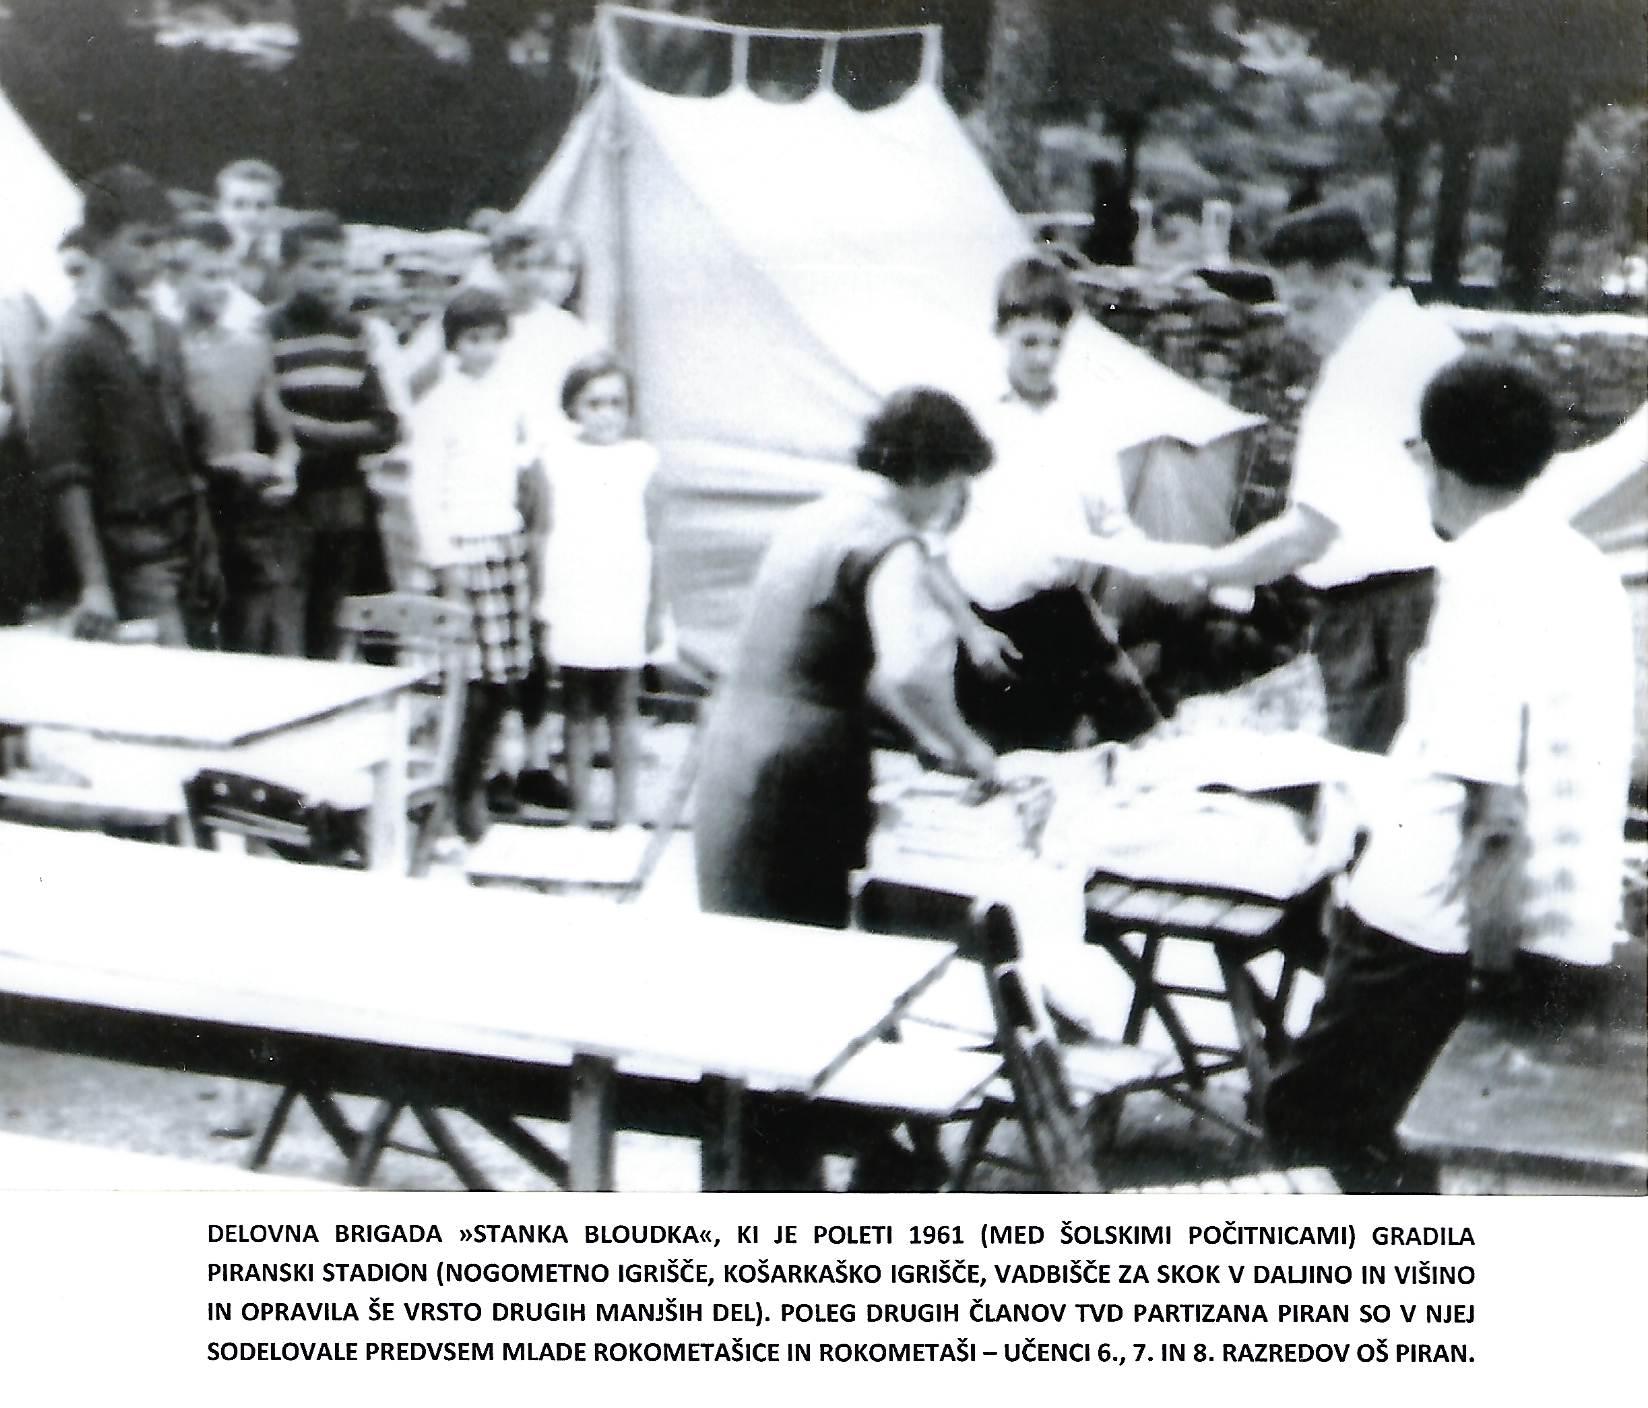 Piran-1961_delovna-brigada-stanka-bloudka_check-in